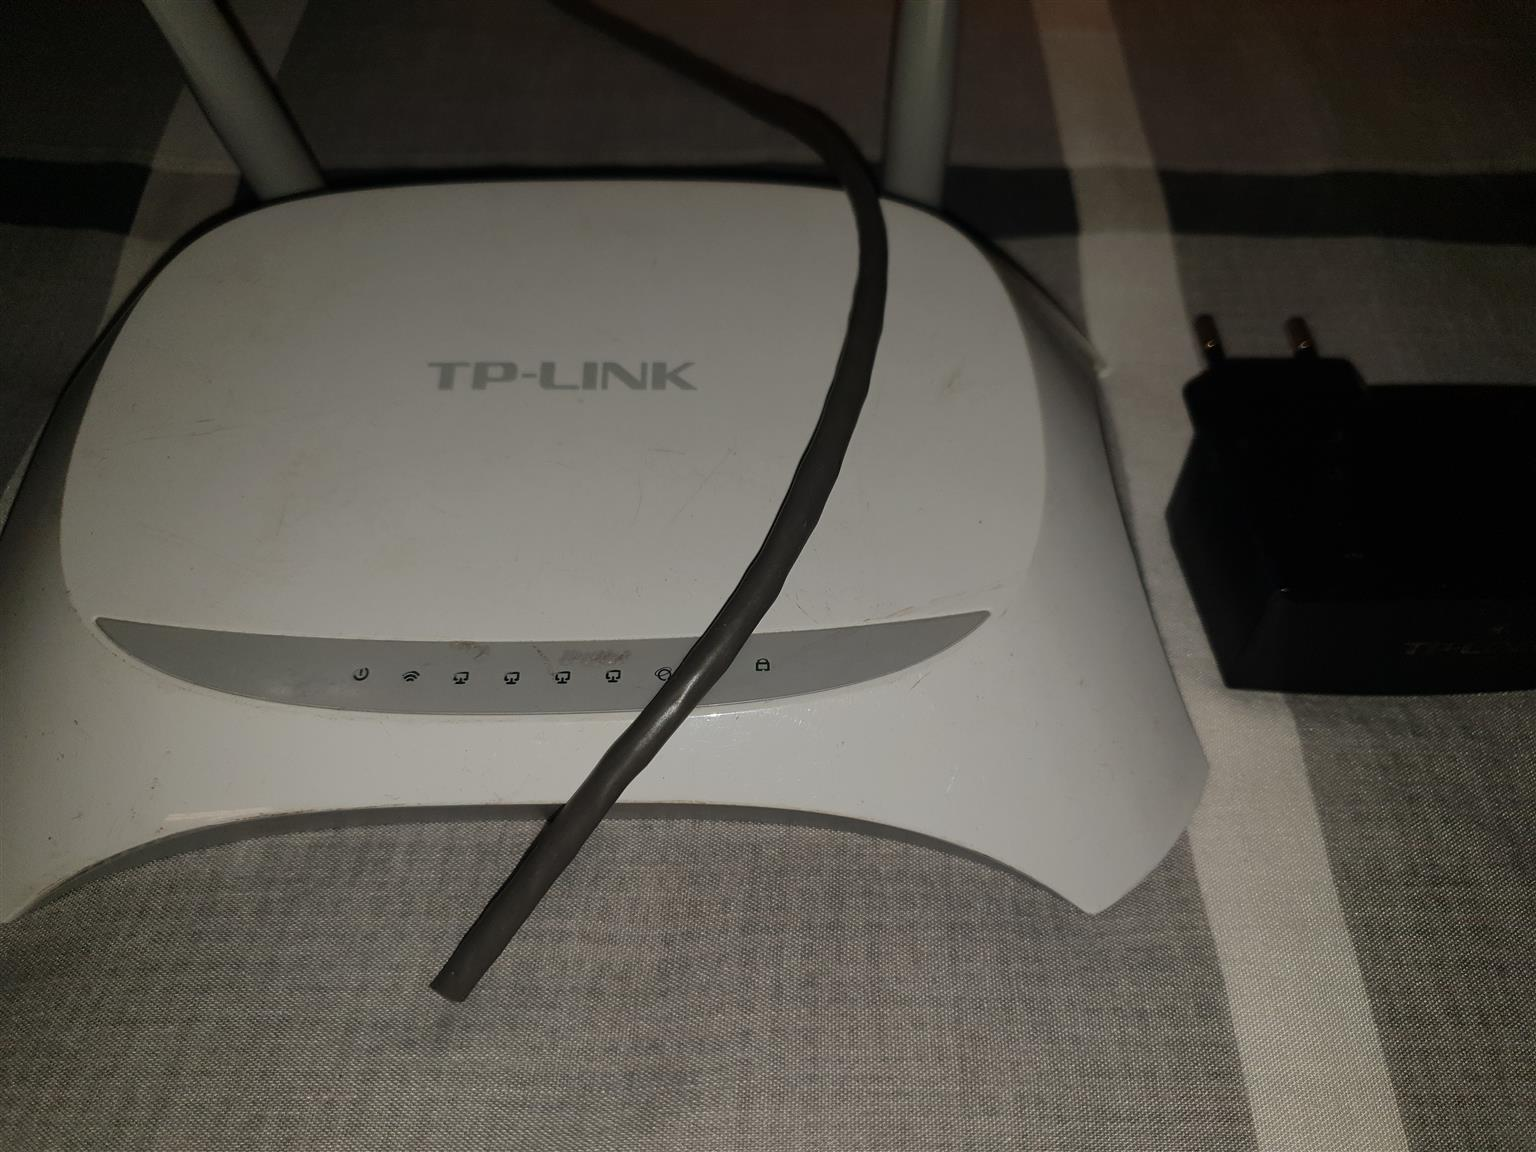 CCTV Infrared Camera x 2 + 3G wiring + TP link + black box